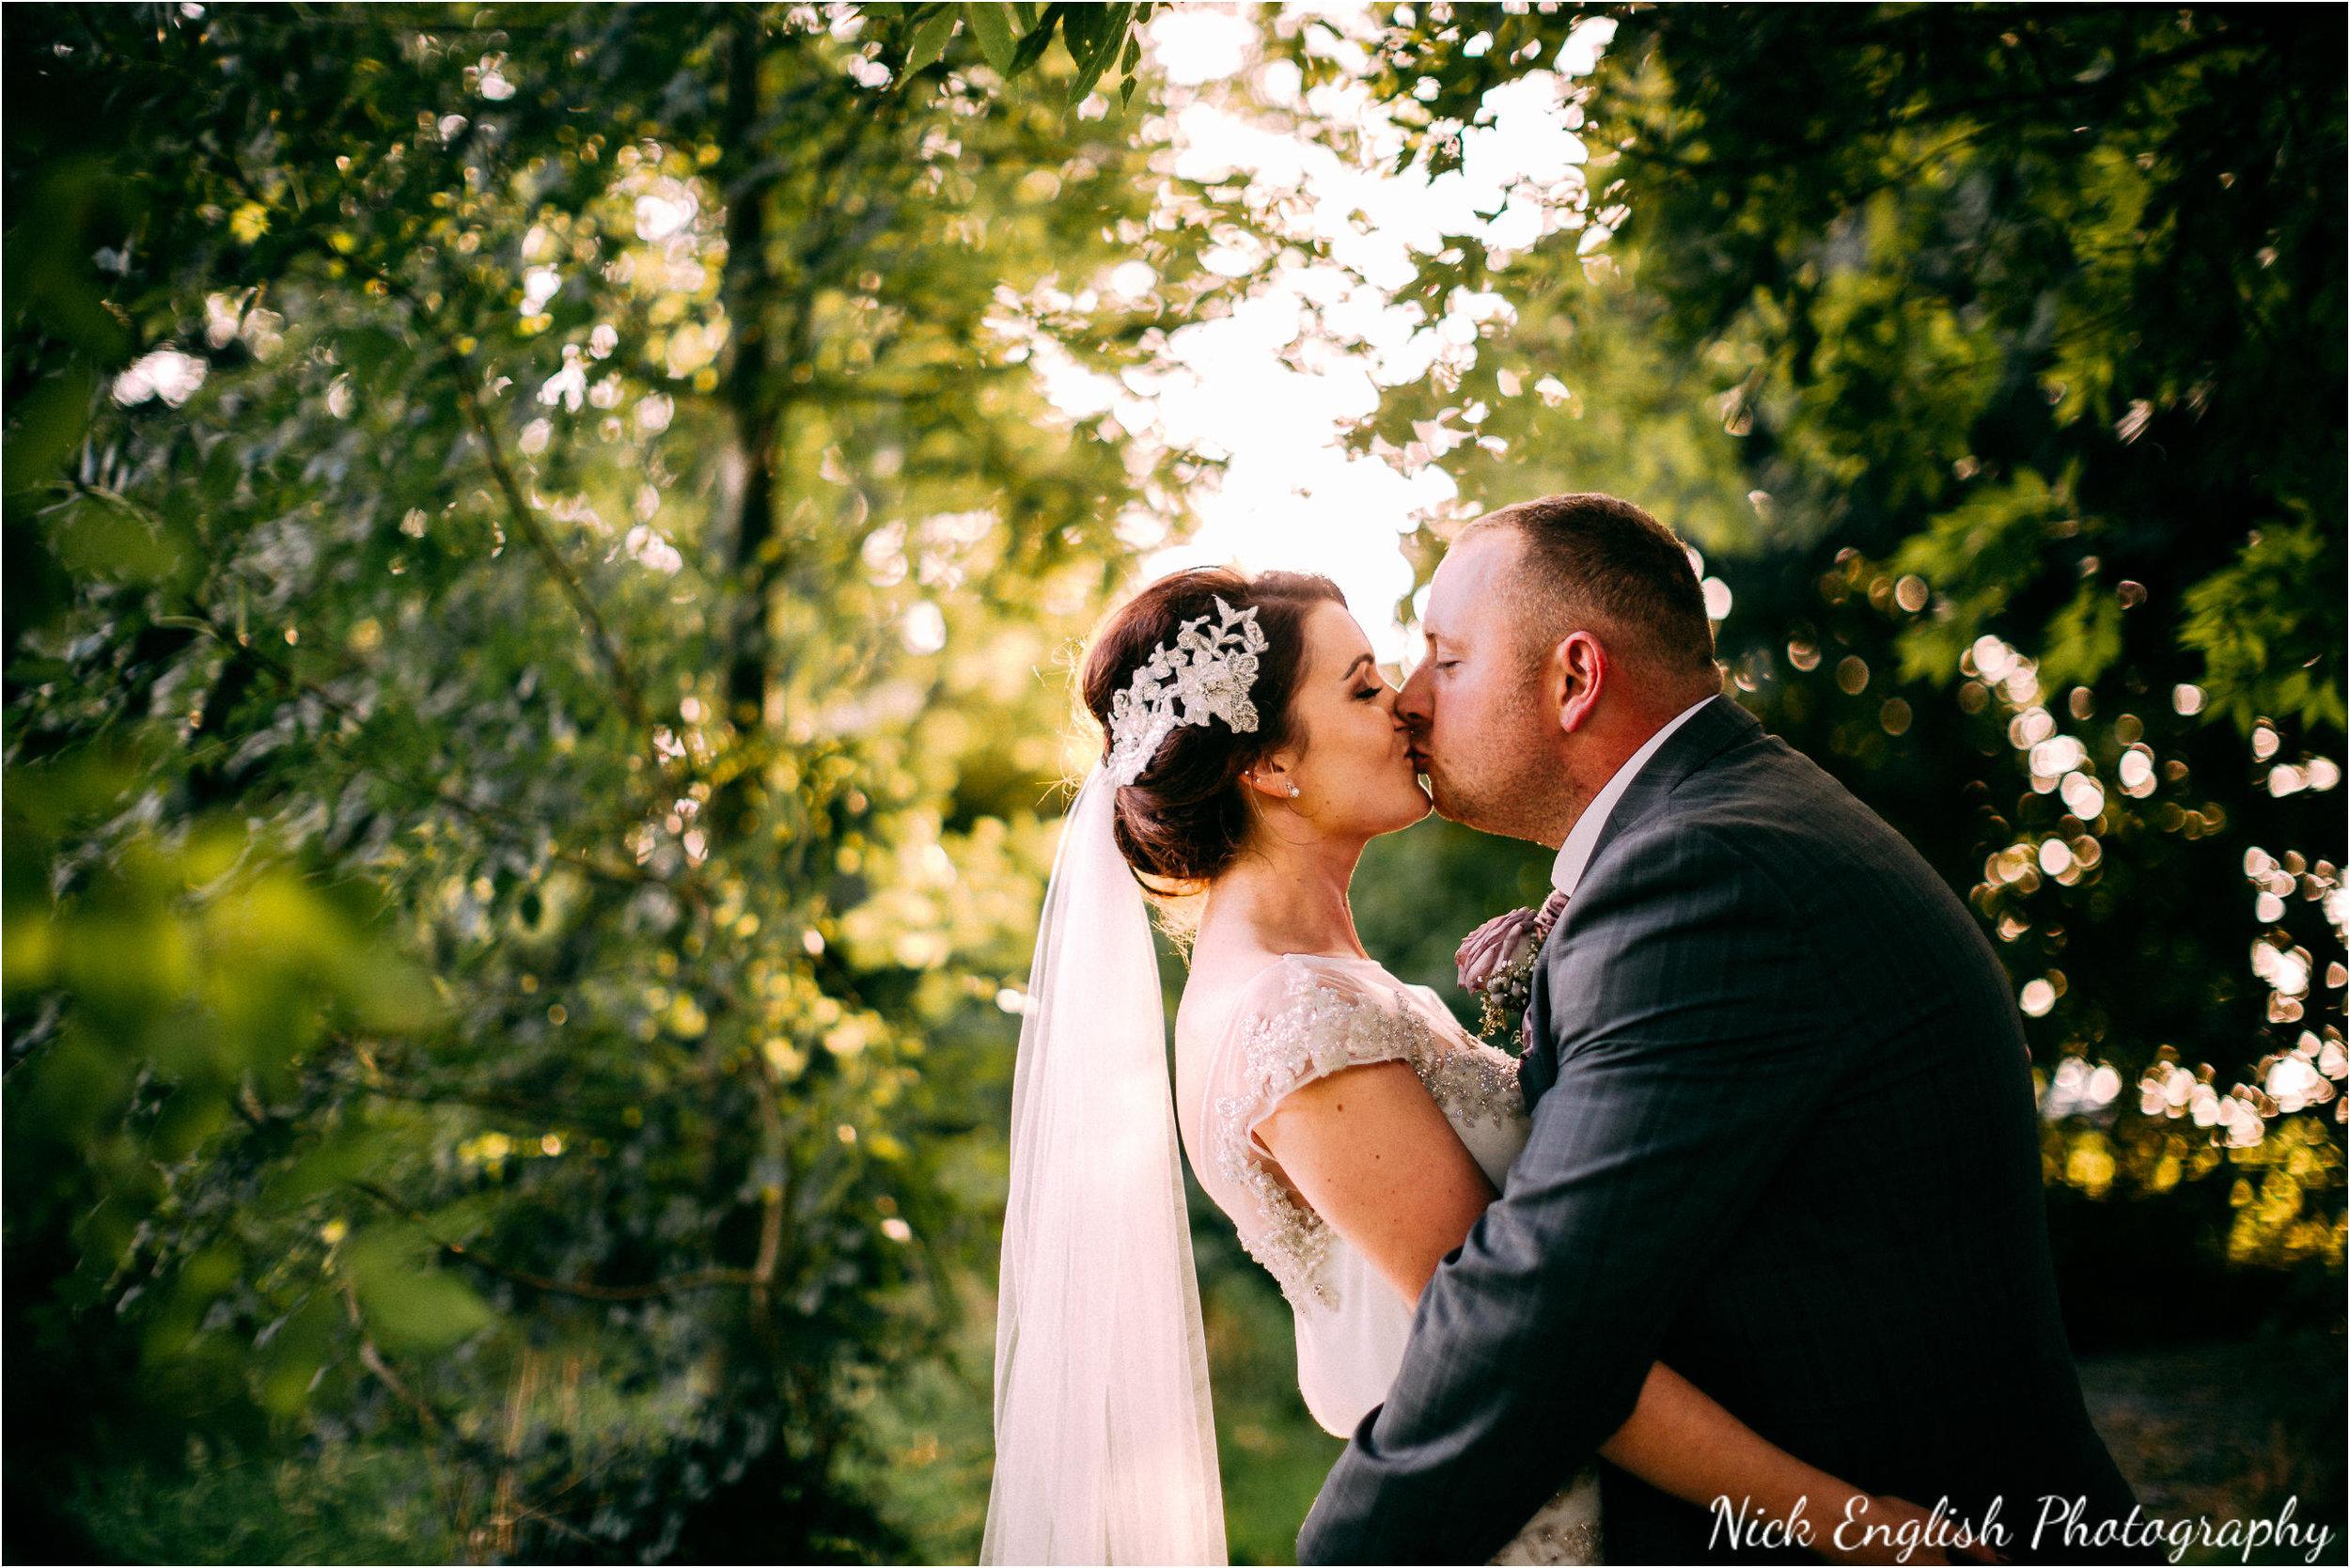 Stacey-Ash-Wedding-Photographs-Stanley-House-Preston-Lancashire-212.jpg